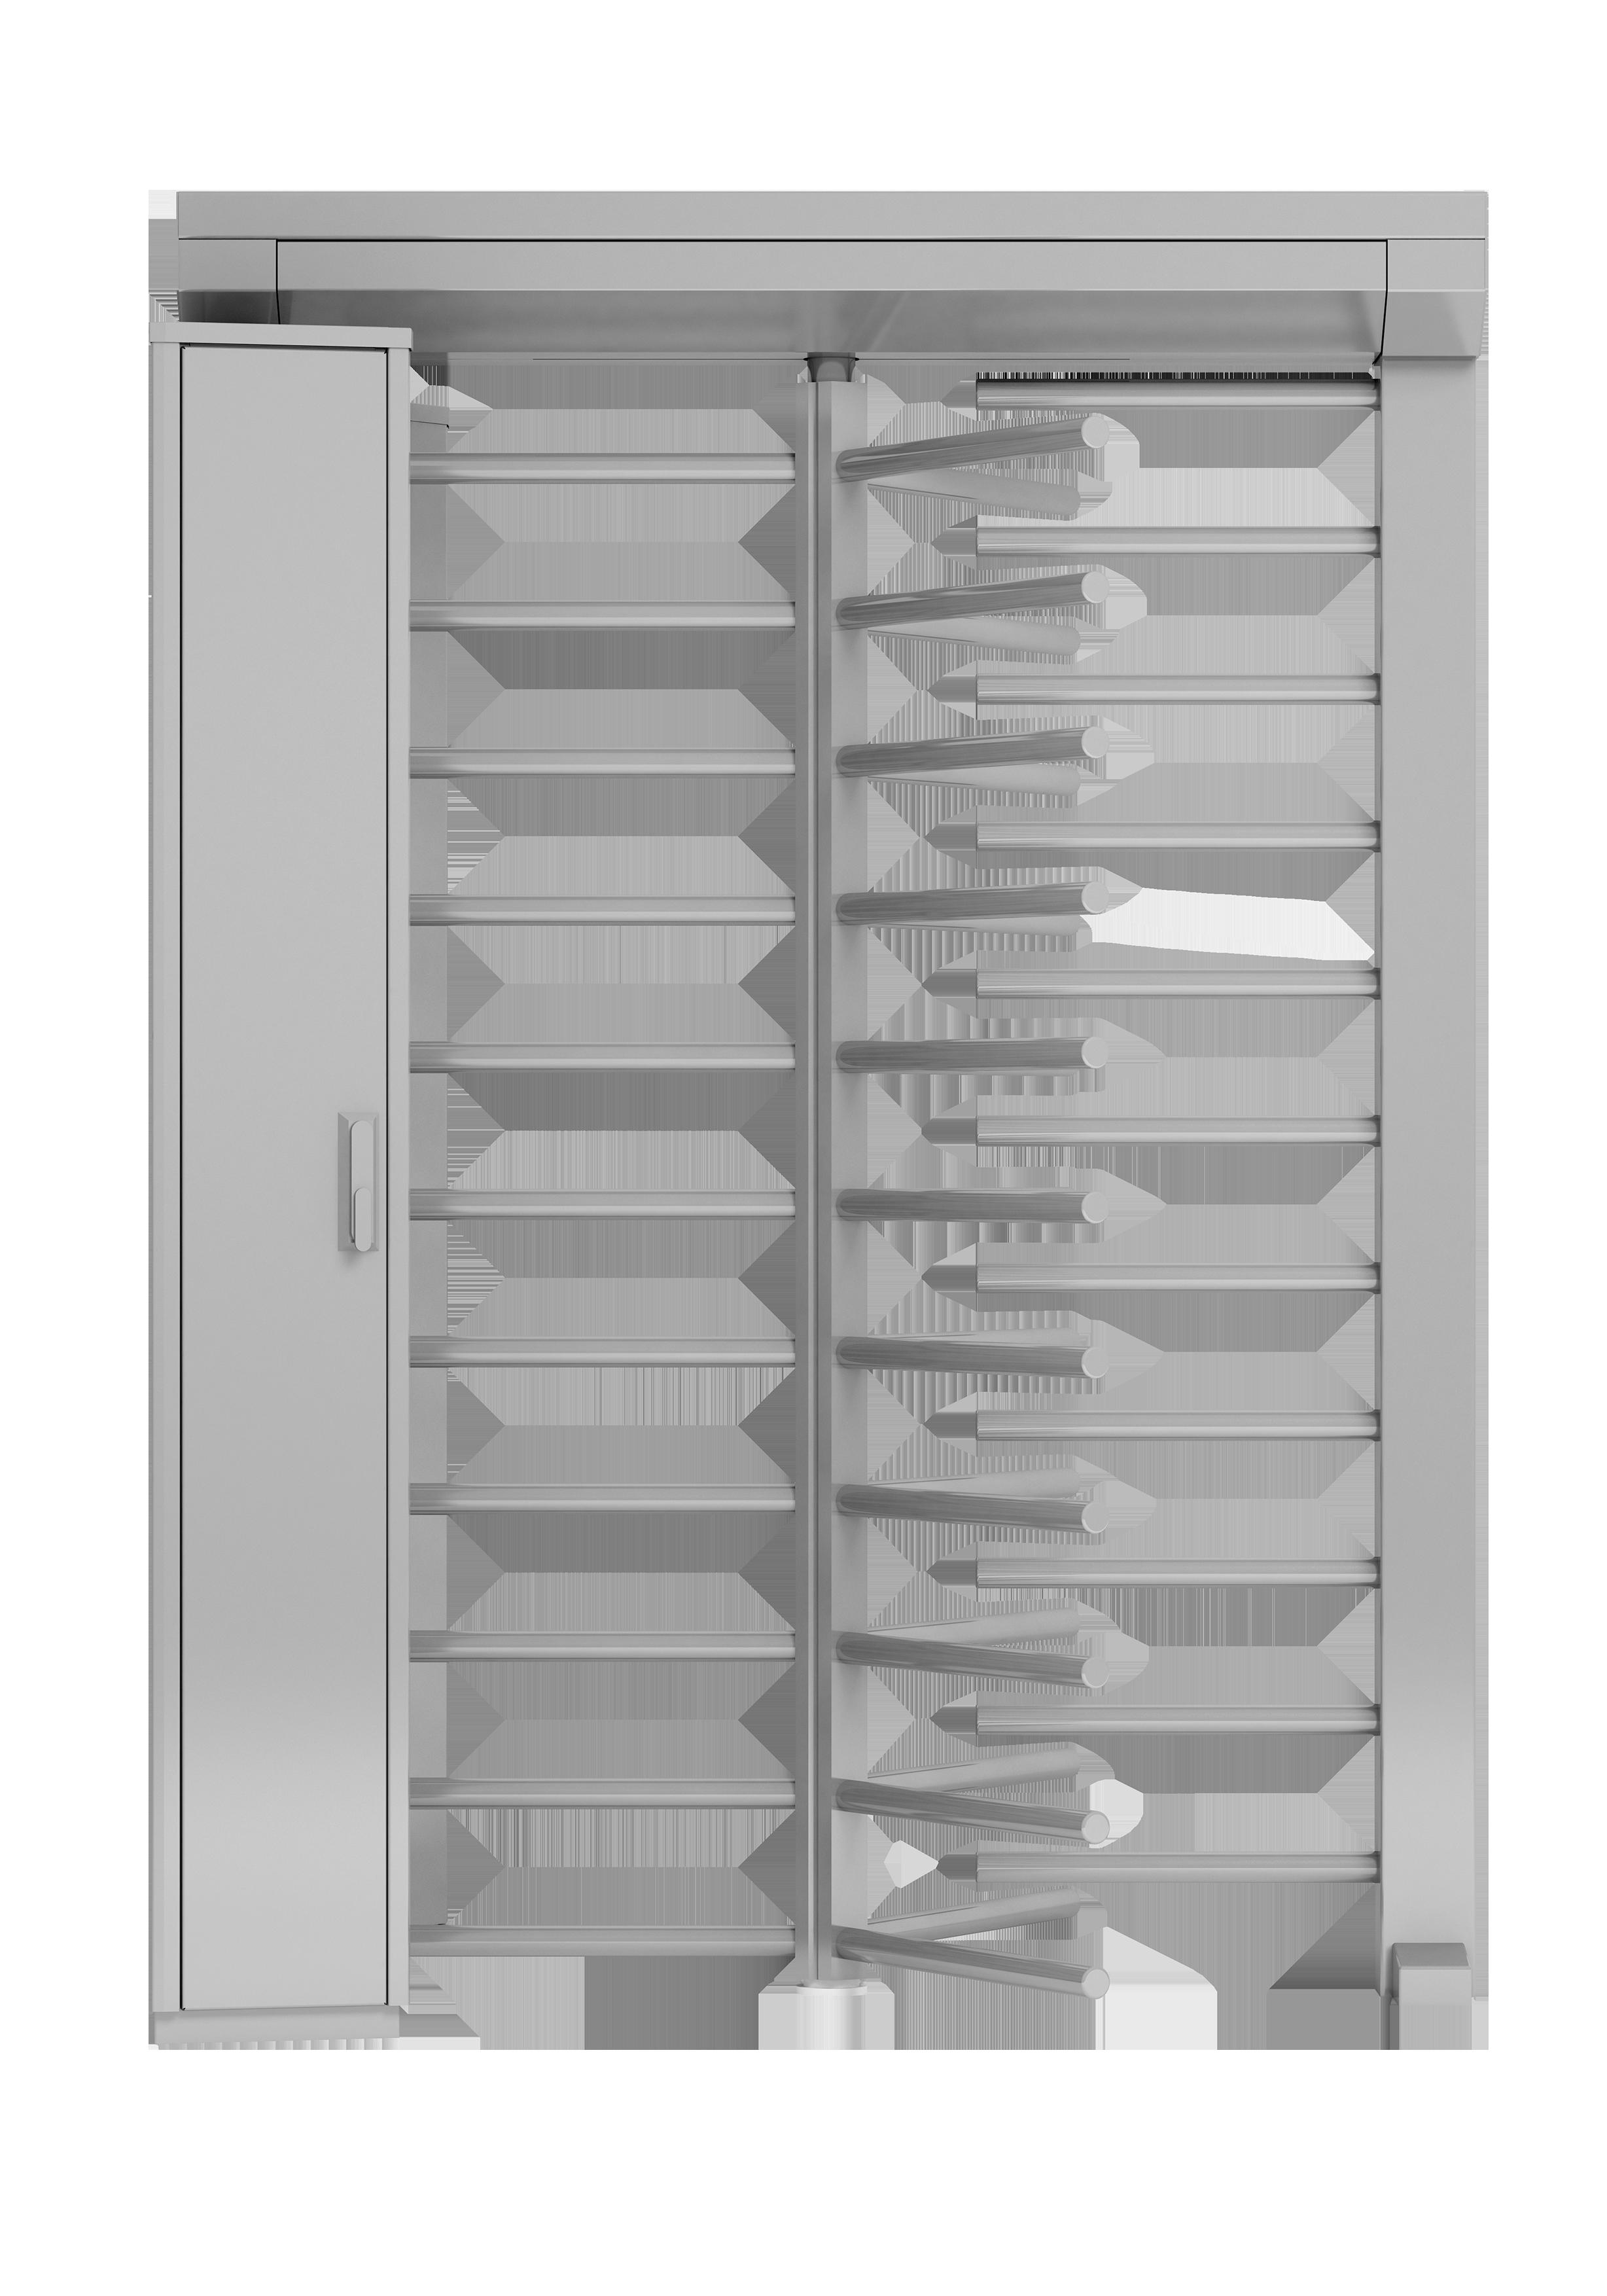 ECCO.120.HB_front